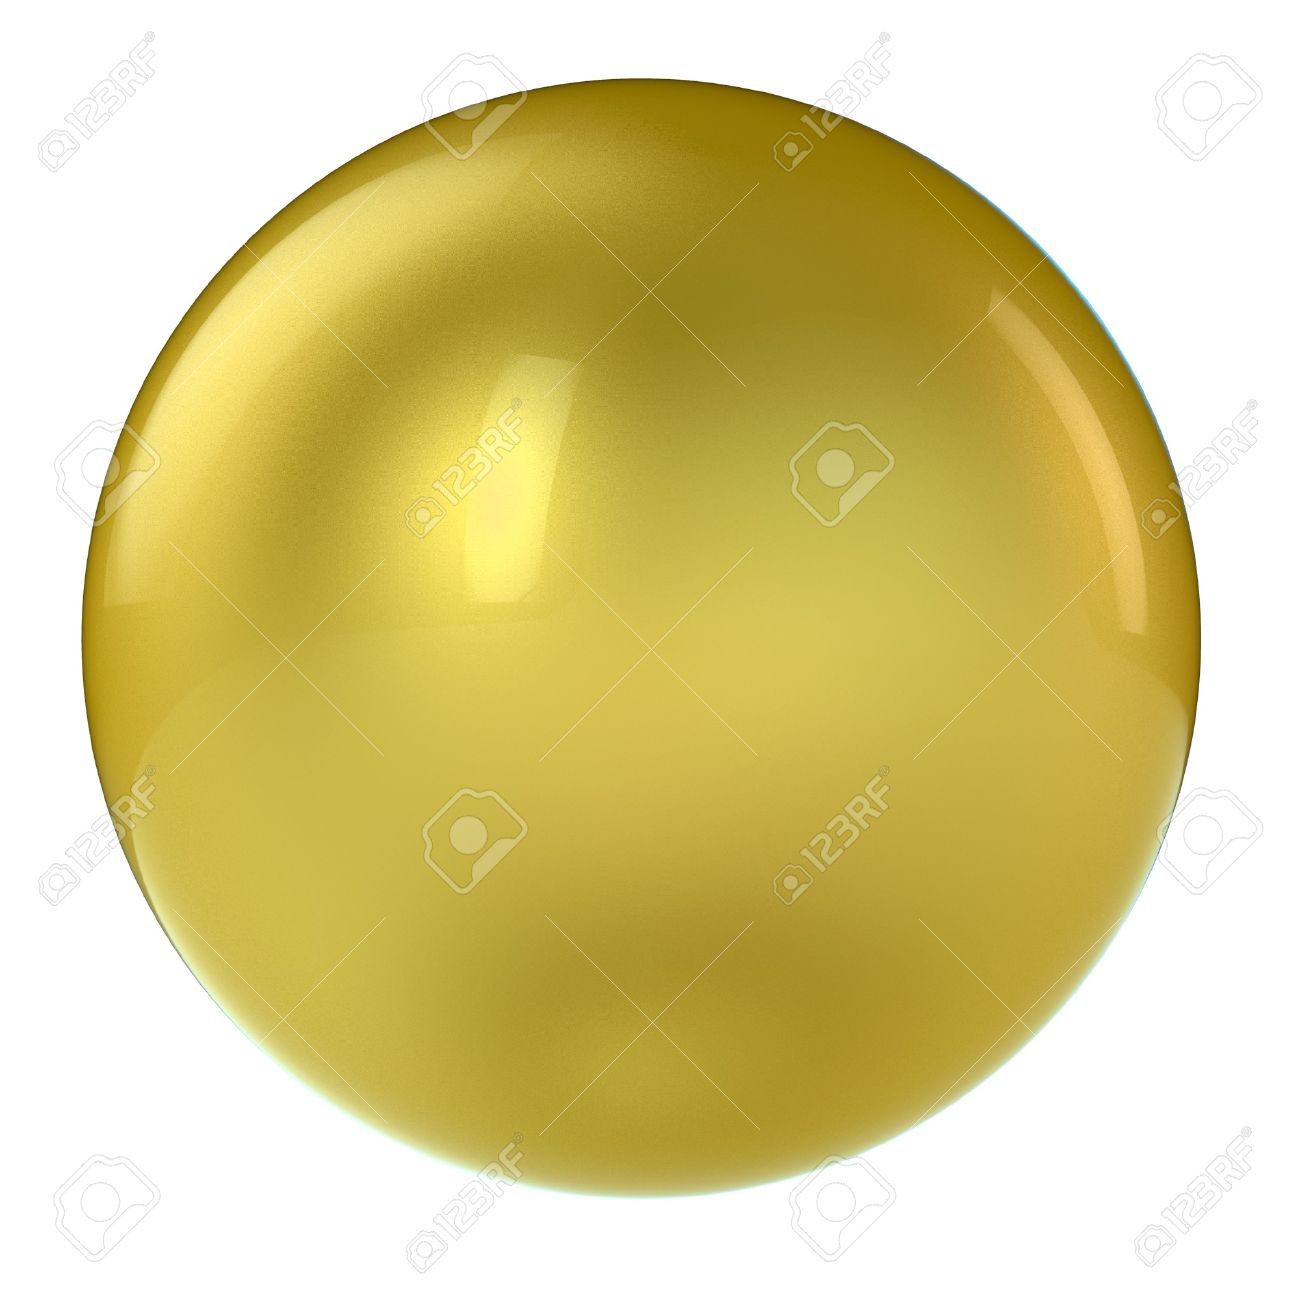 3d golden sphere in studio environment isolated on white Stock Photo - 8188037